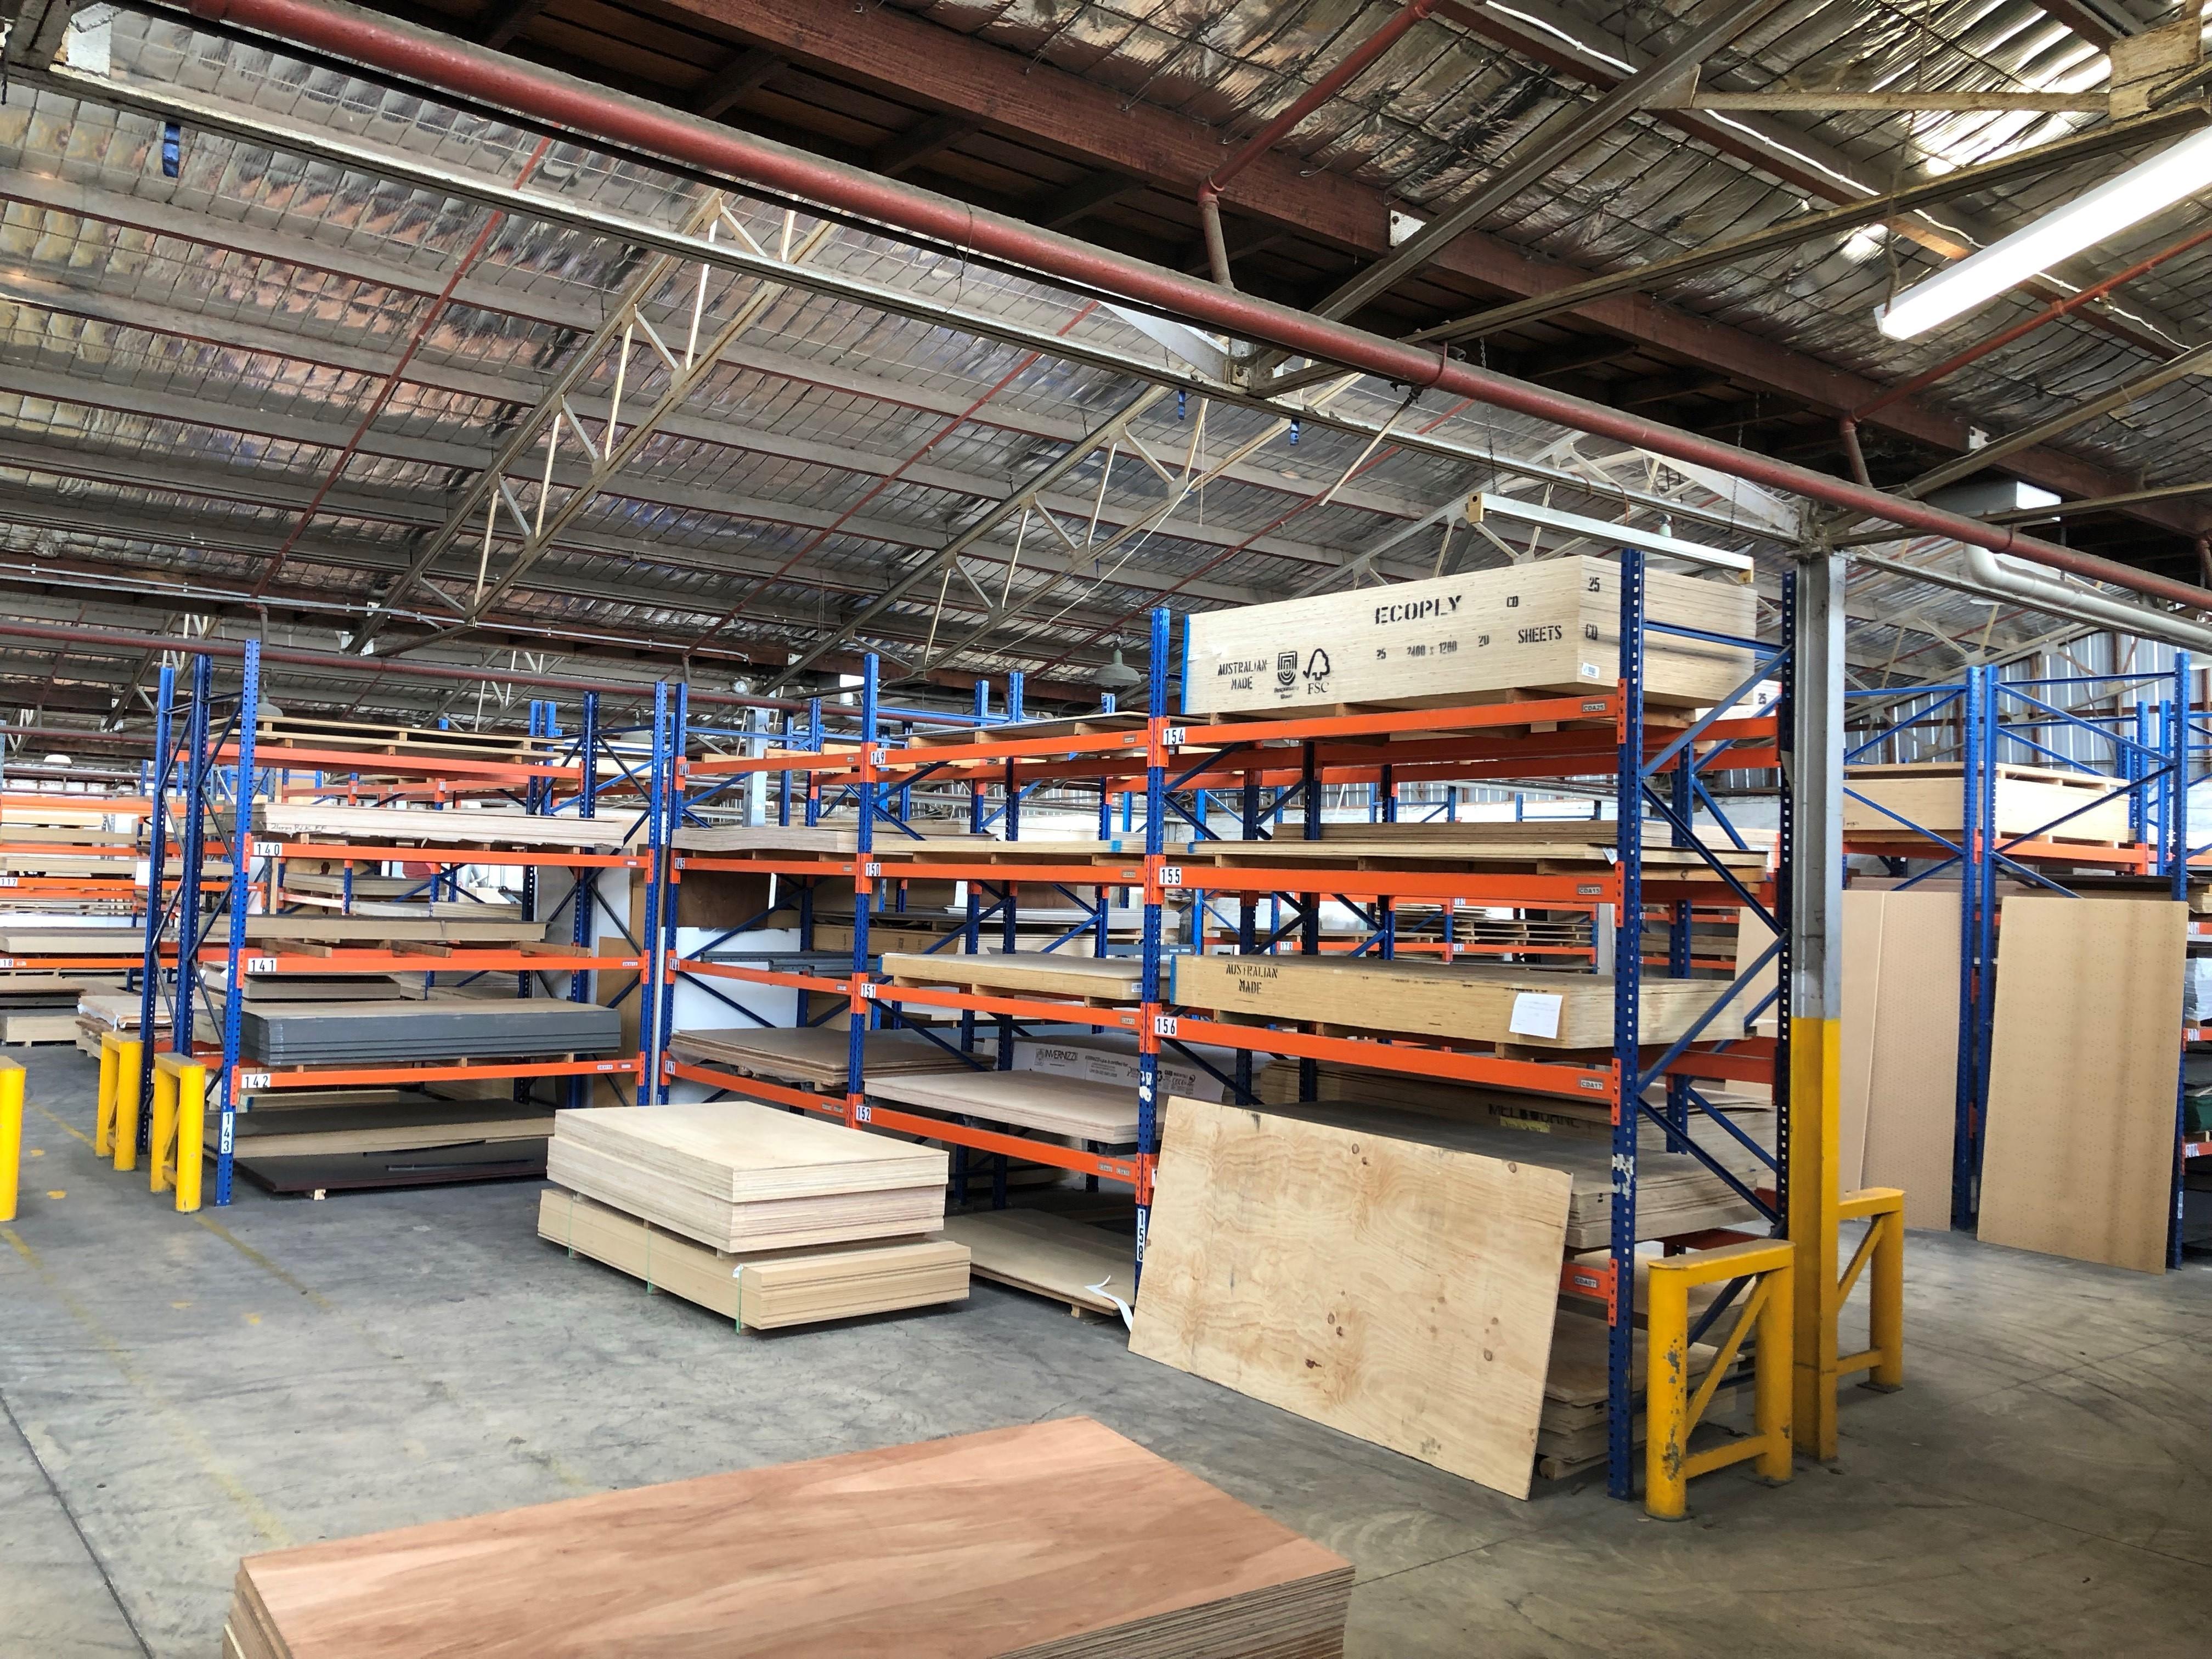 plyco plywood warehouse